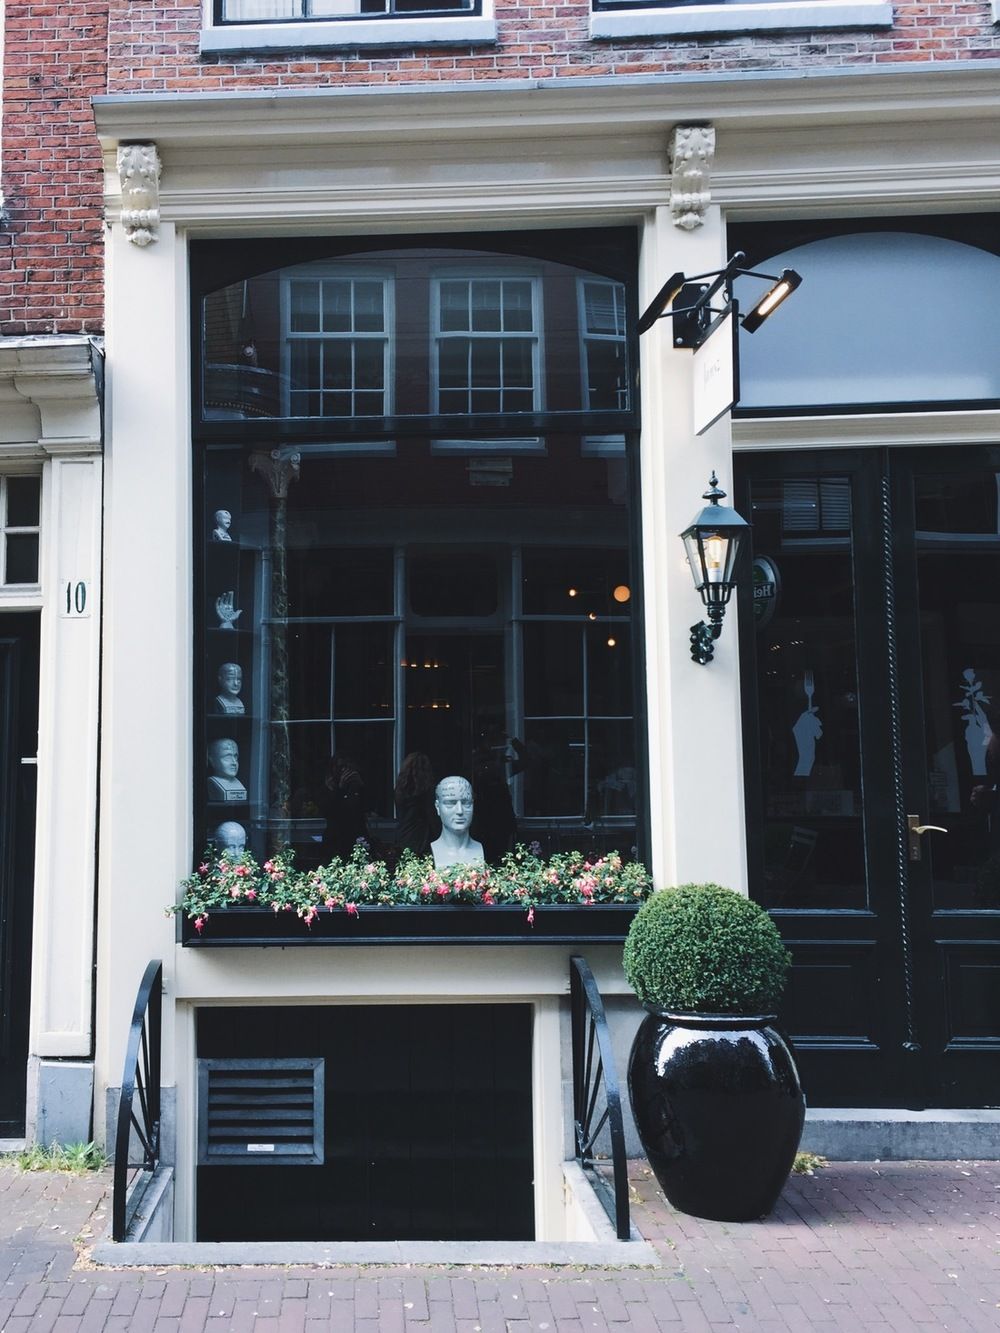 Jansz. Amsterdam